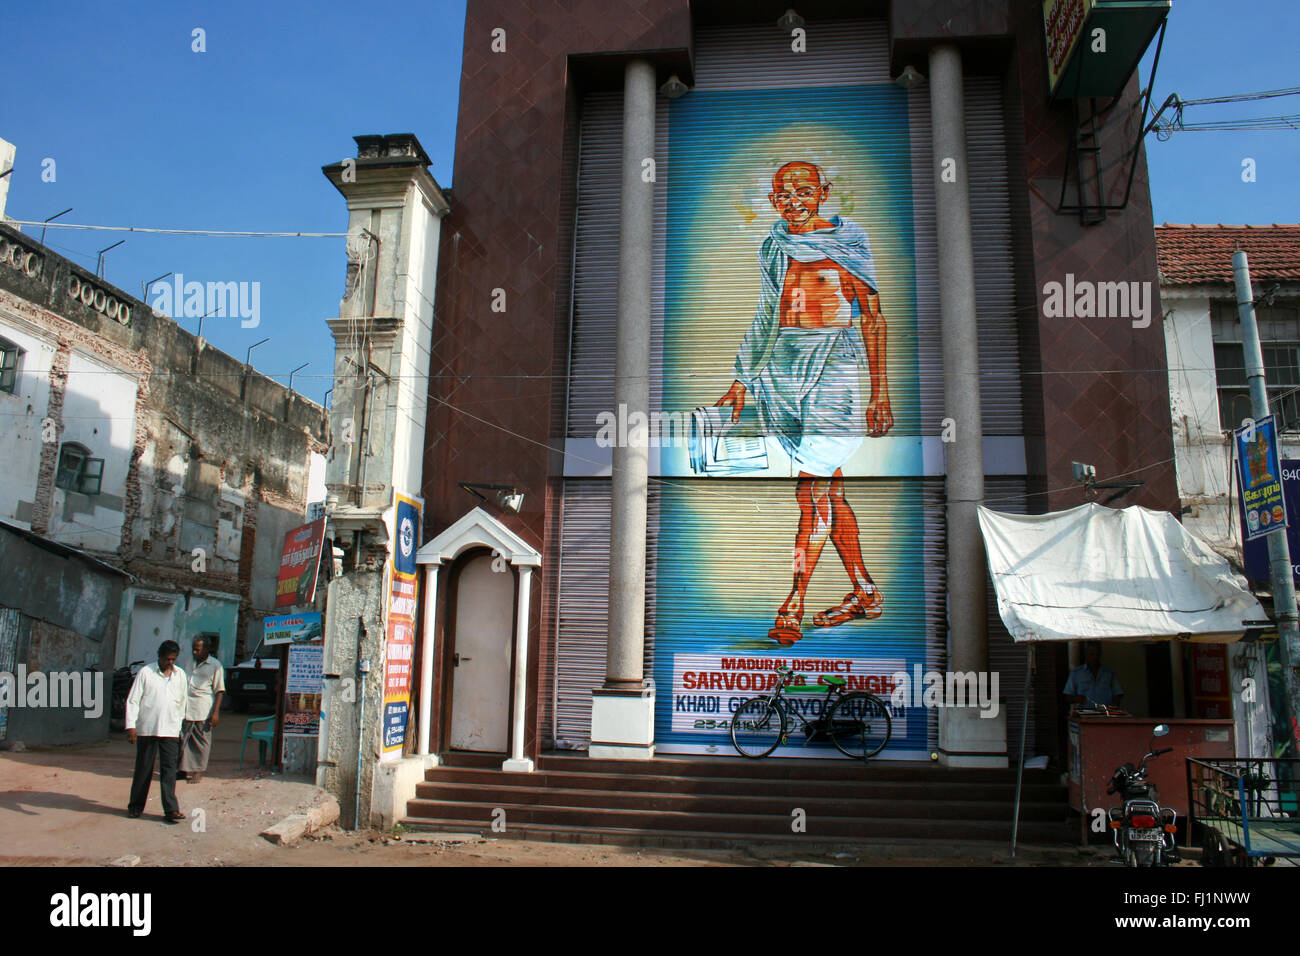 Incontri gratuiti a Madurai